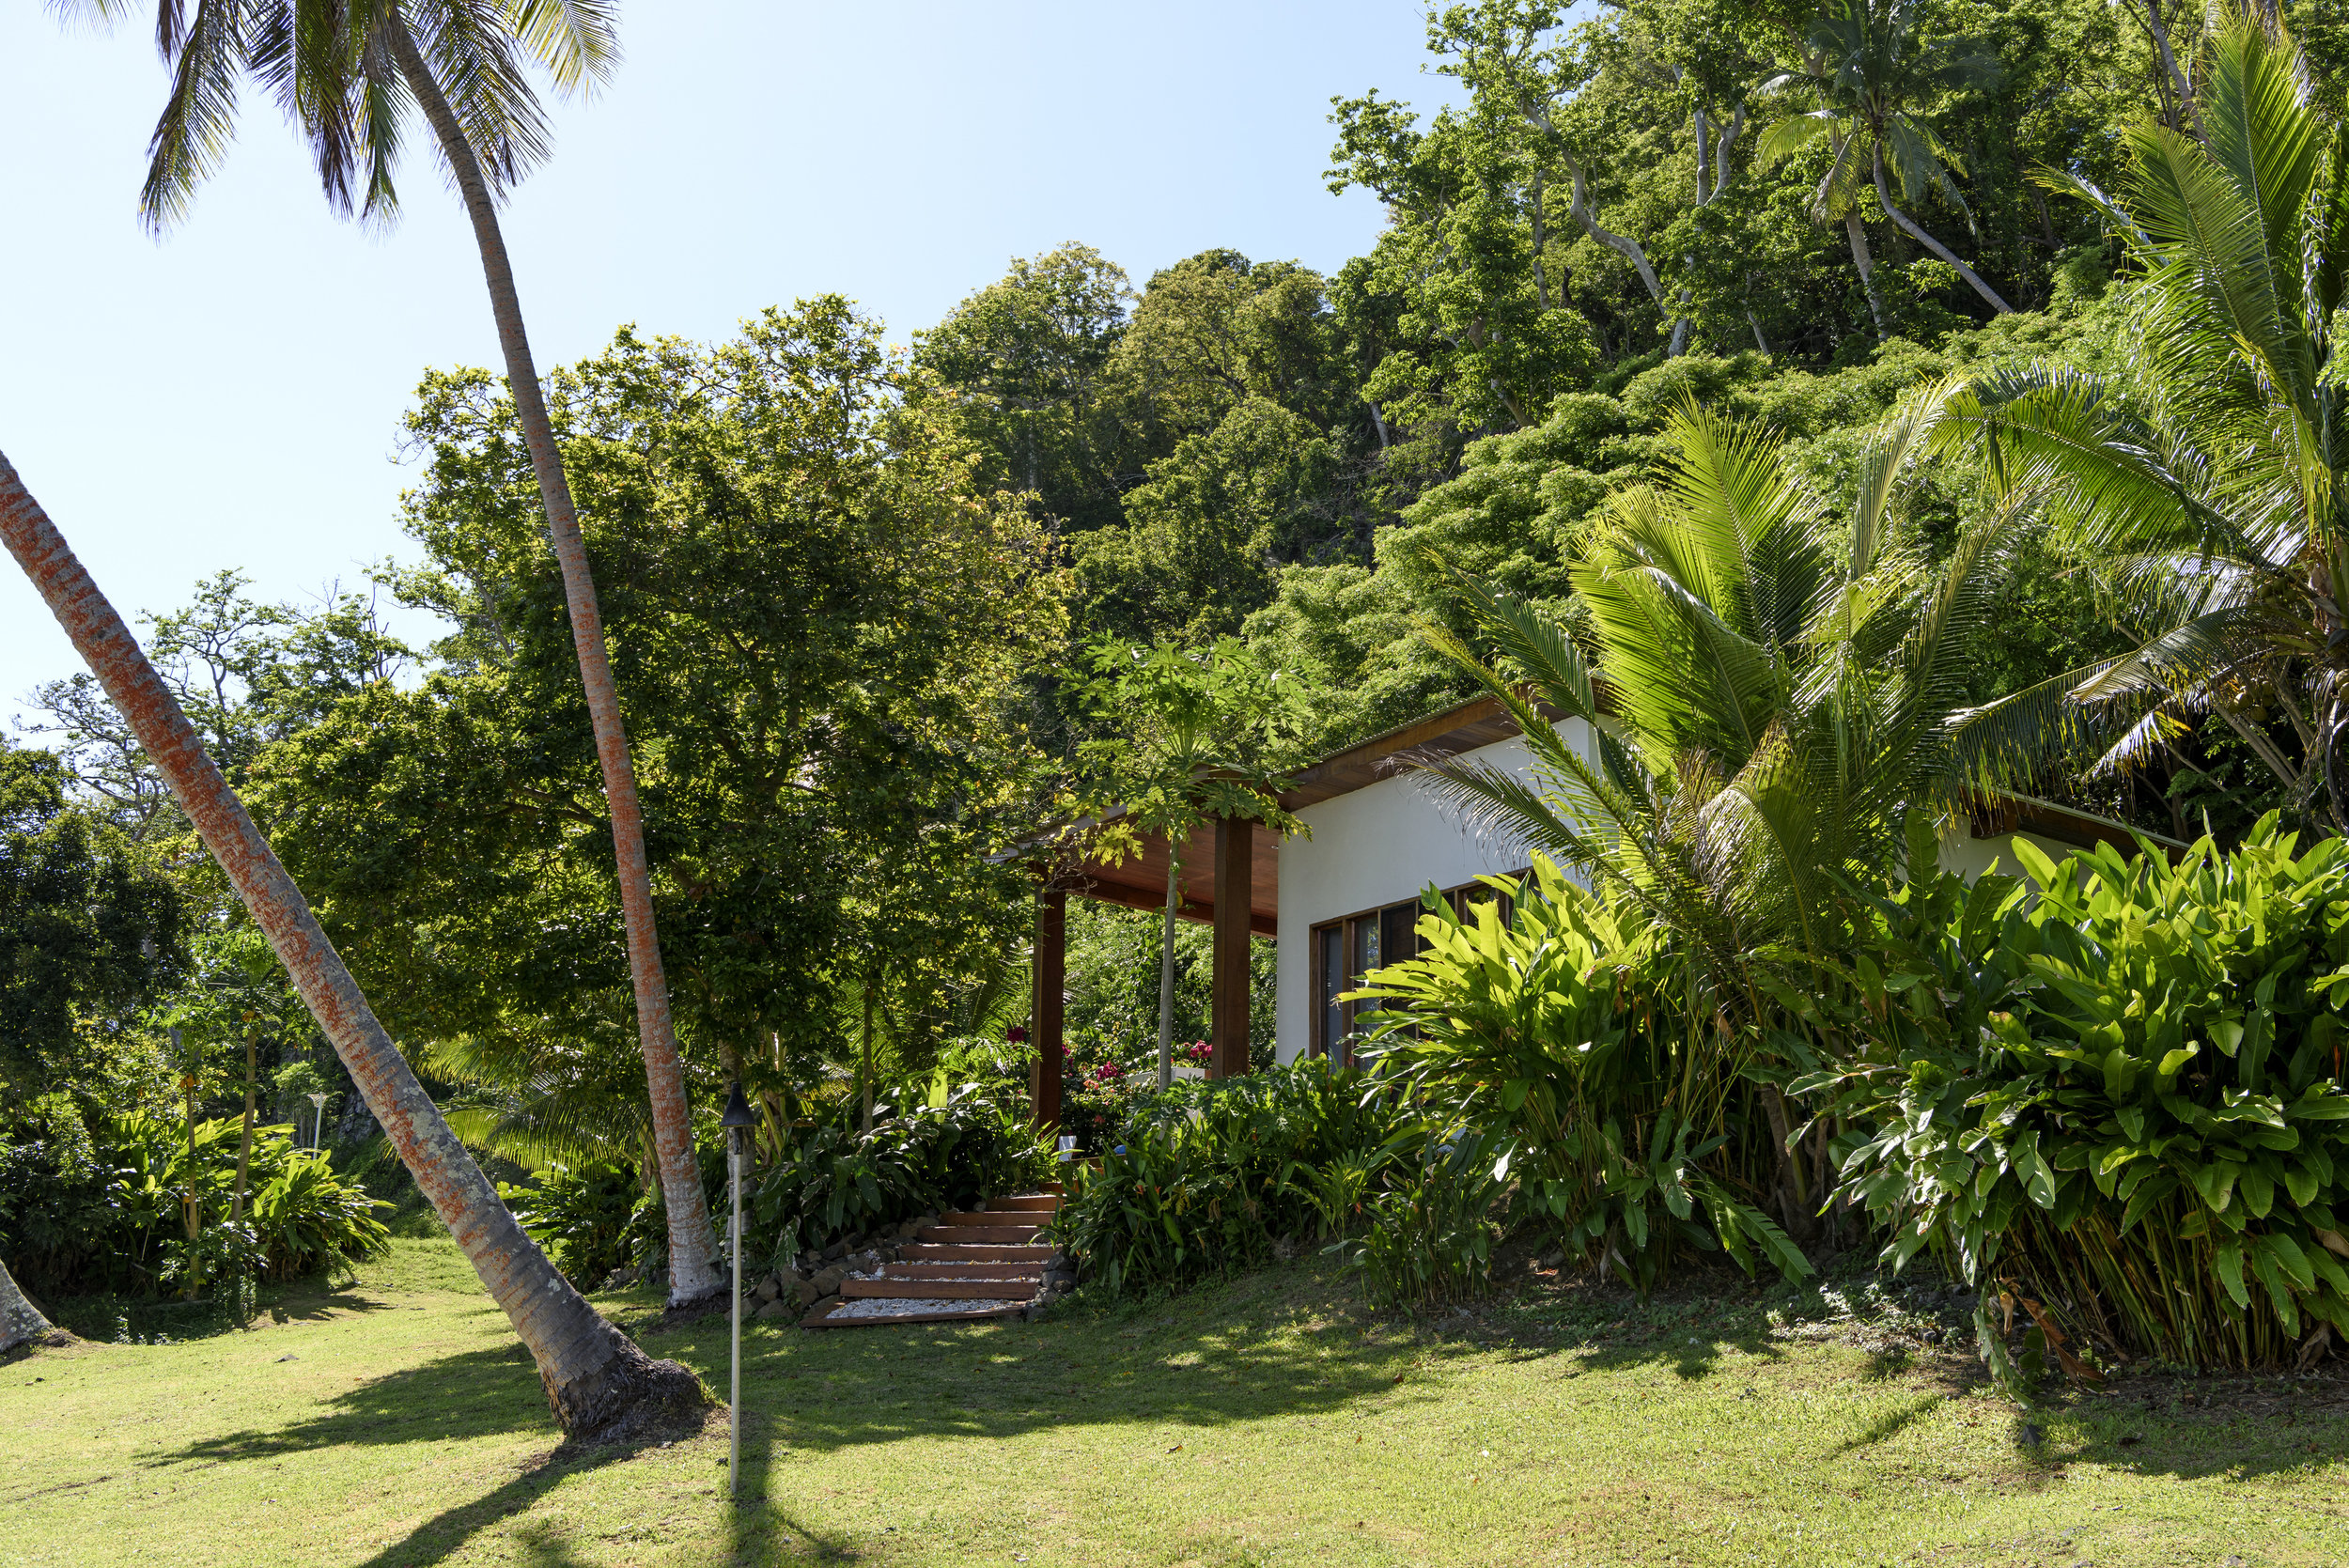 Fiji Resort - Couples Accommodation - Royal Retreat - Honeymoon - The Remote Resort7.jpg